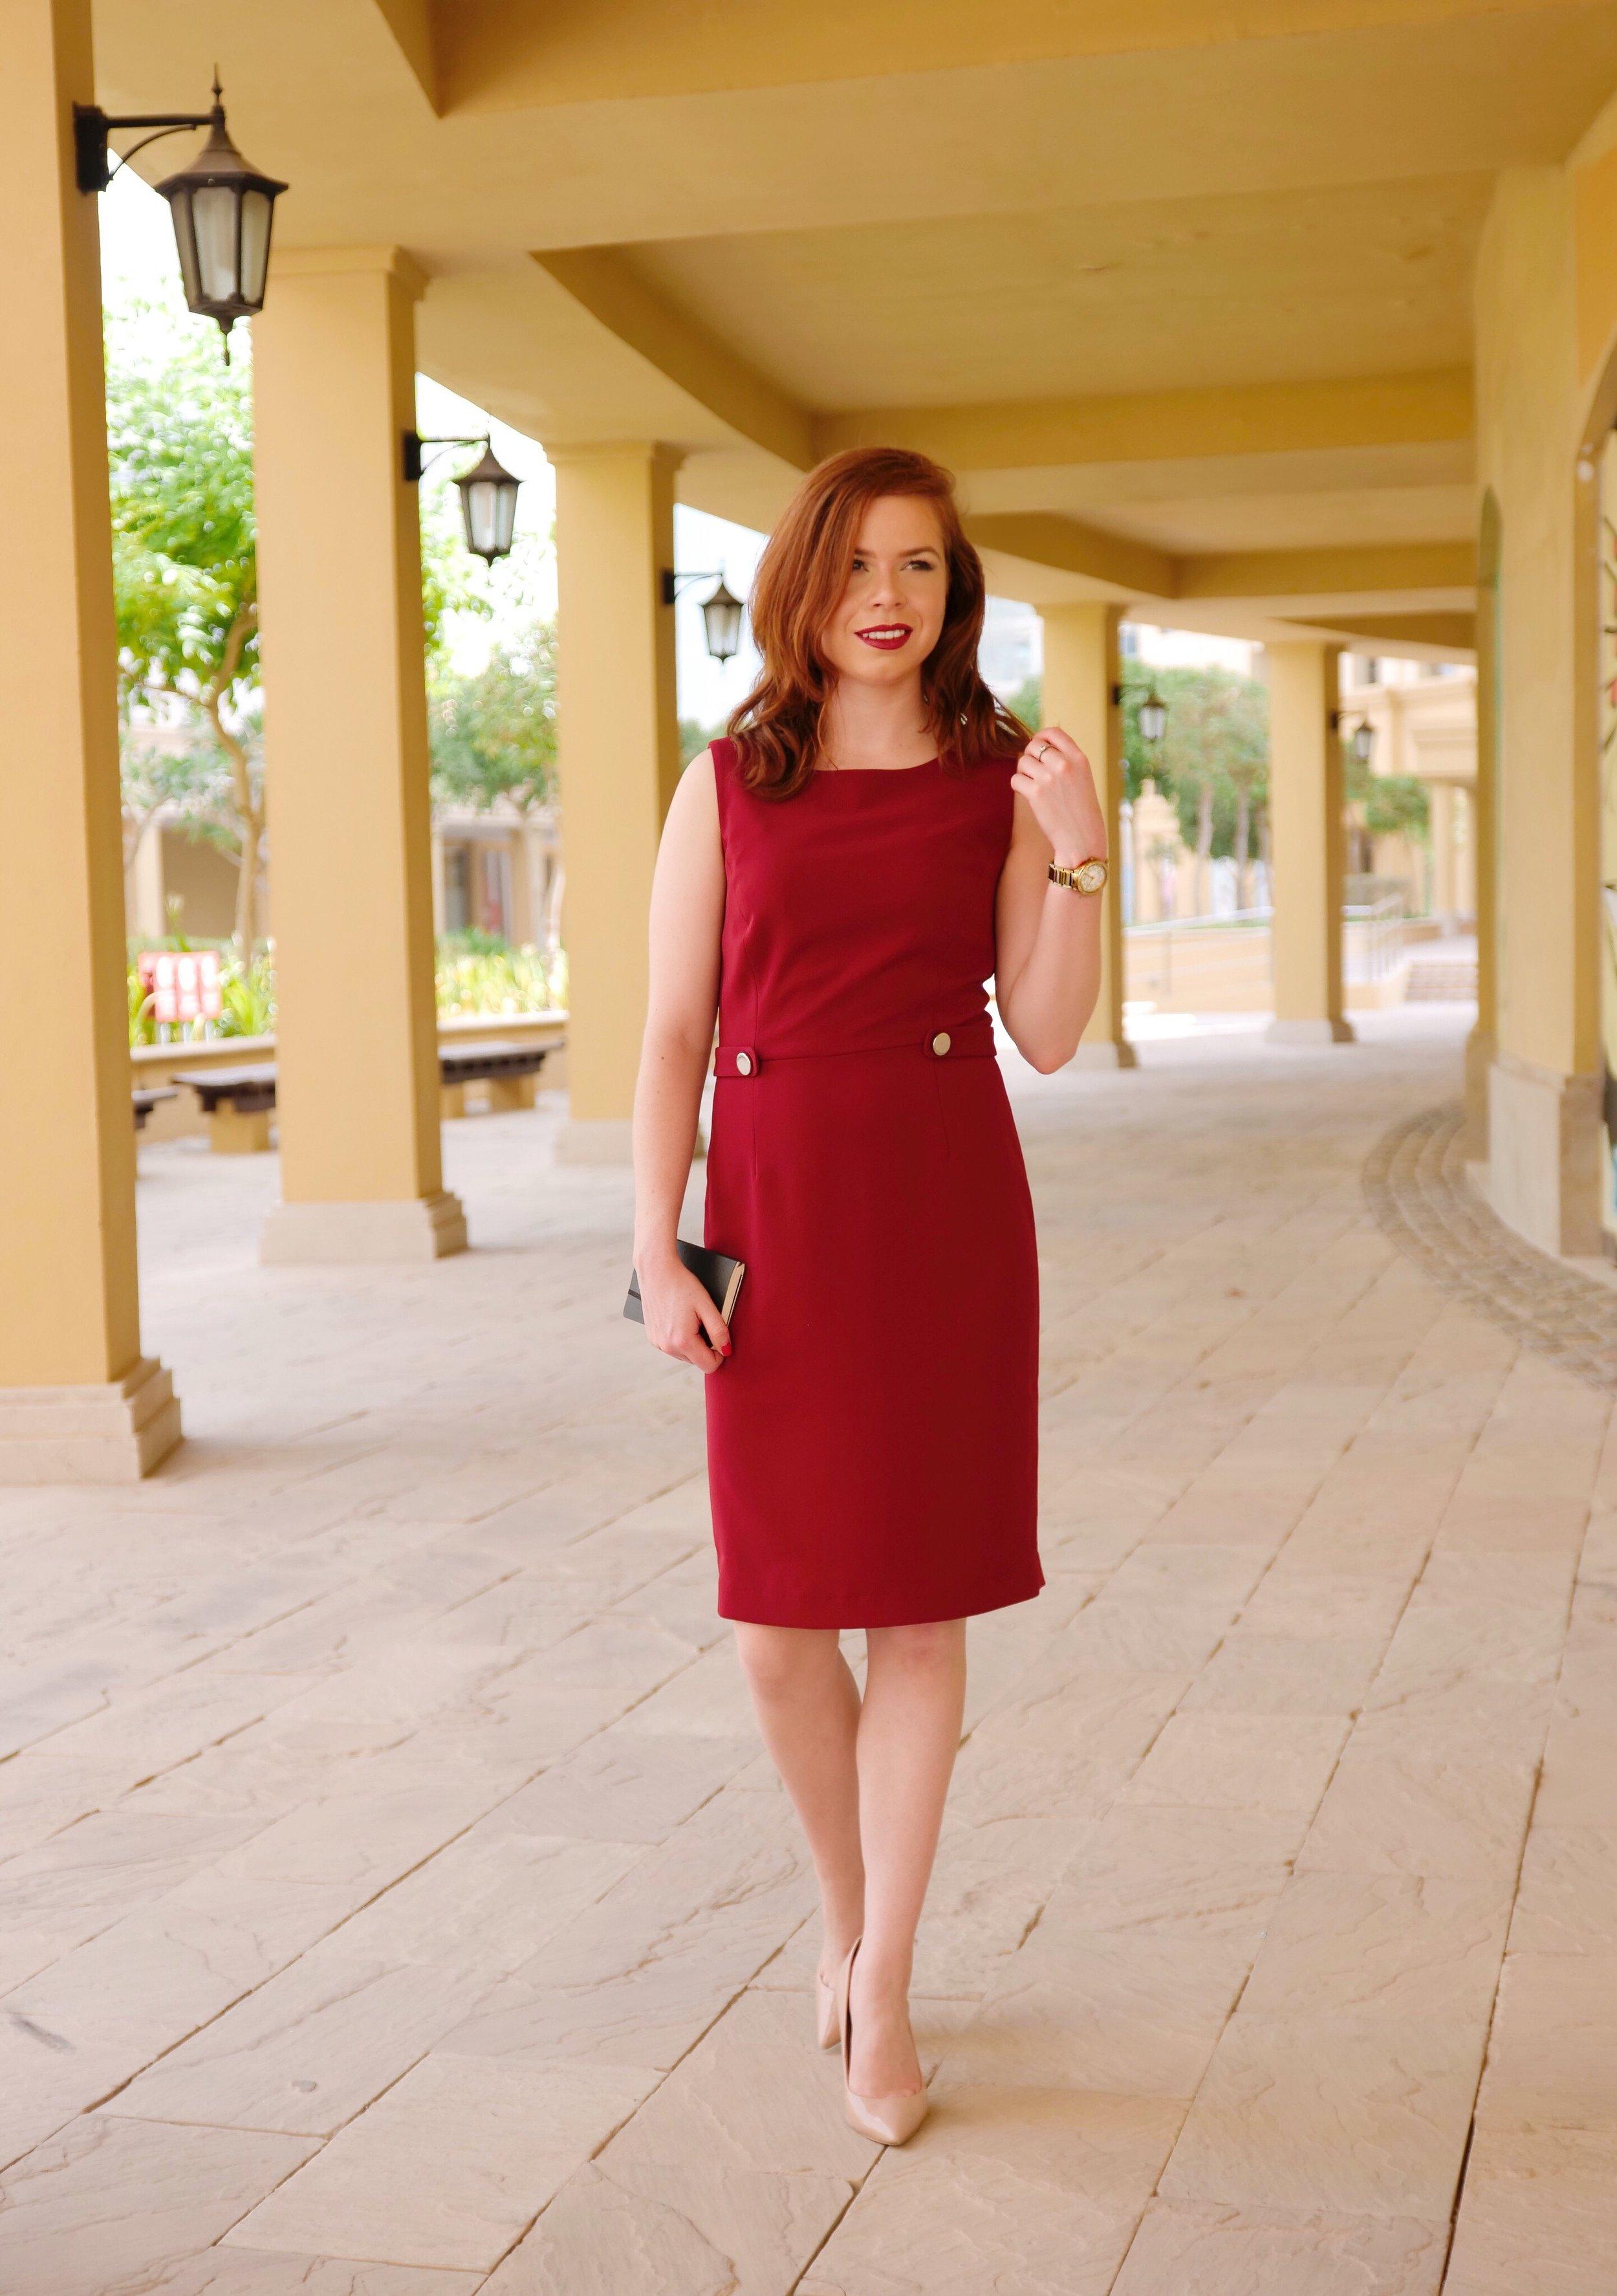 workwear - merlot office dress - nora gardner